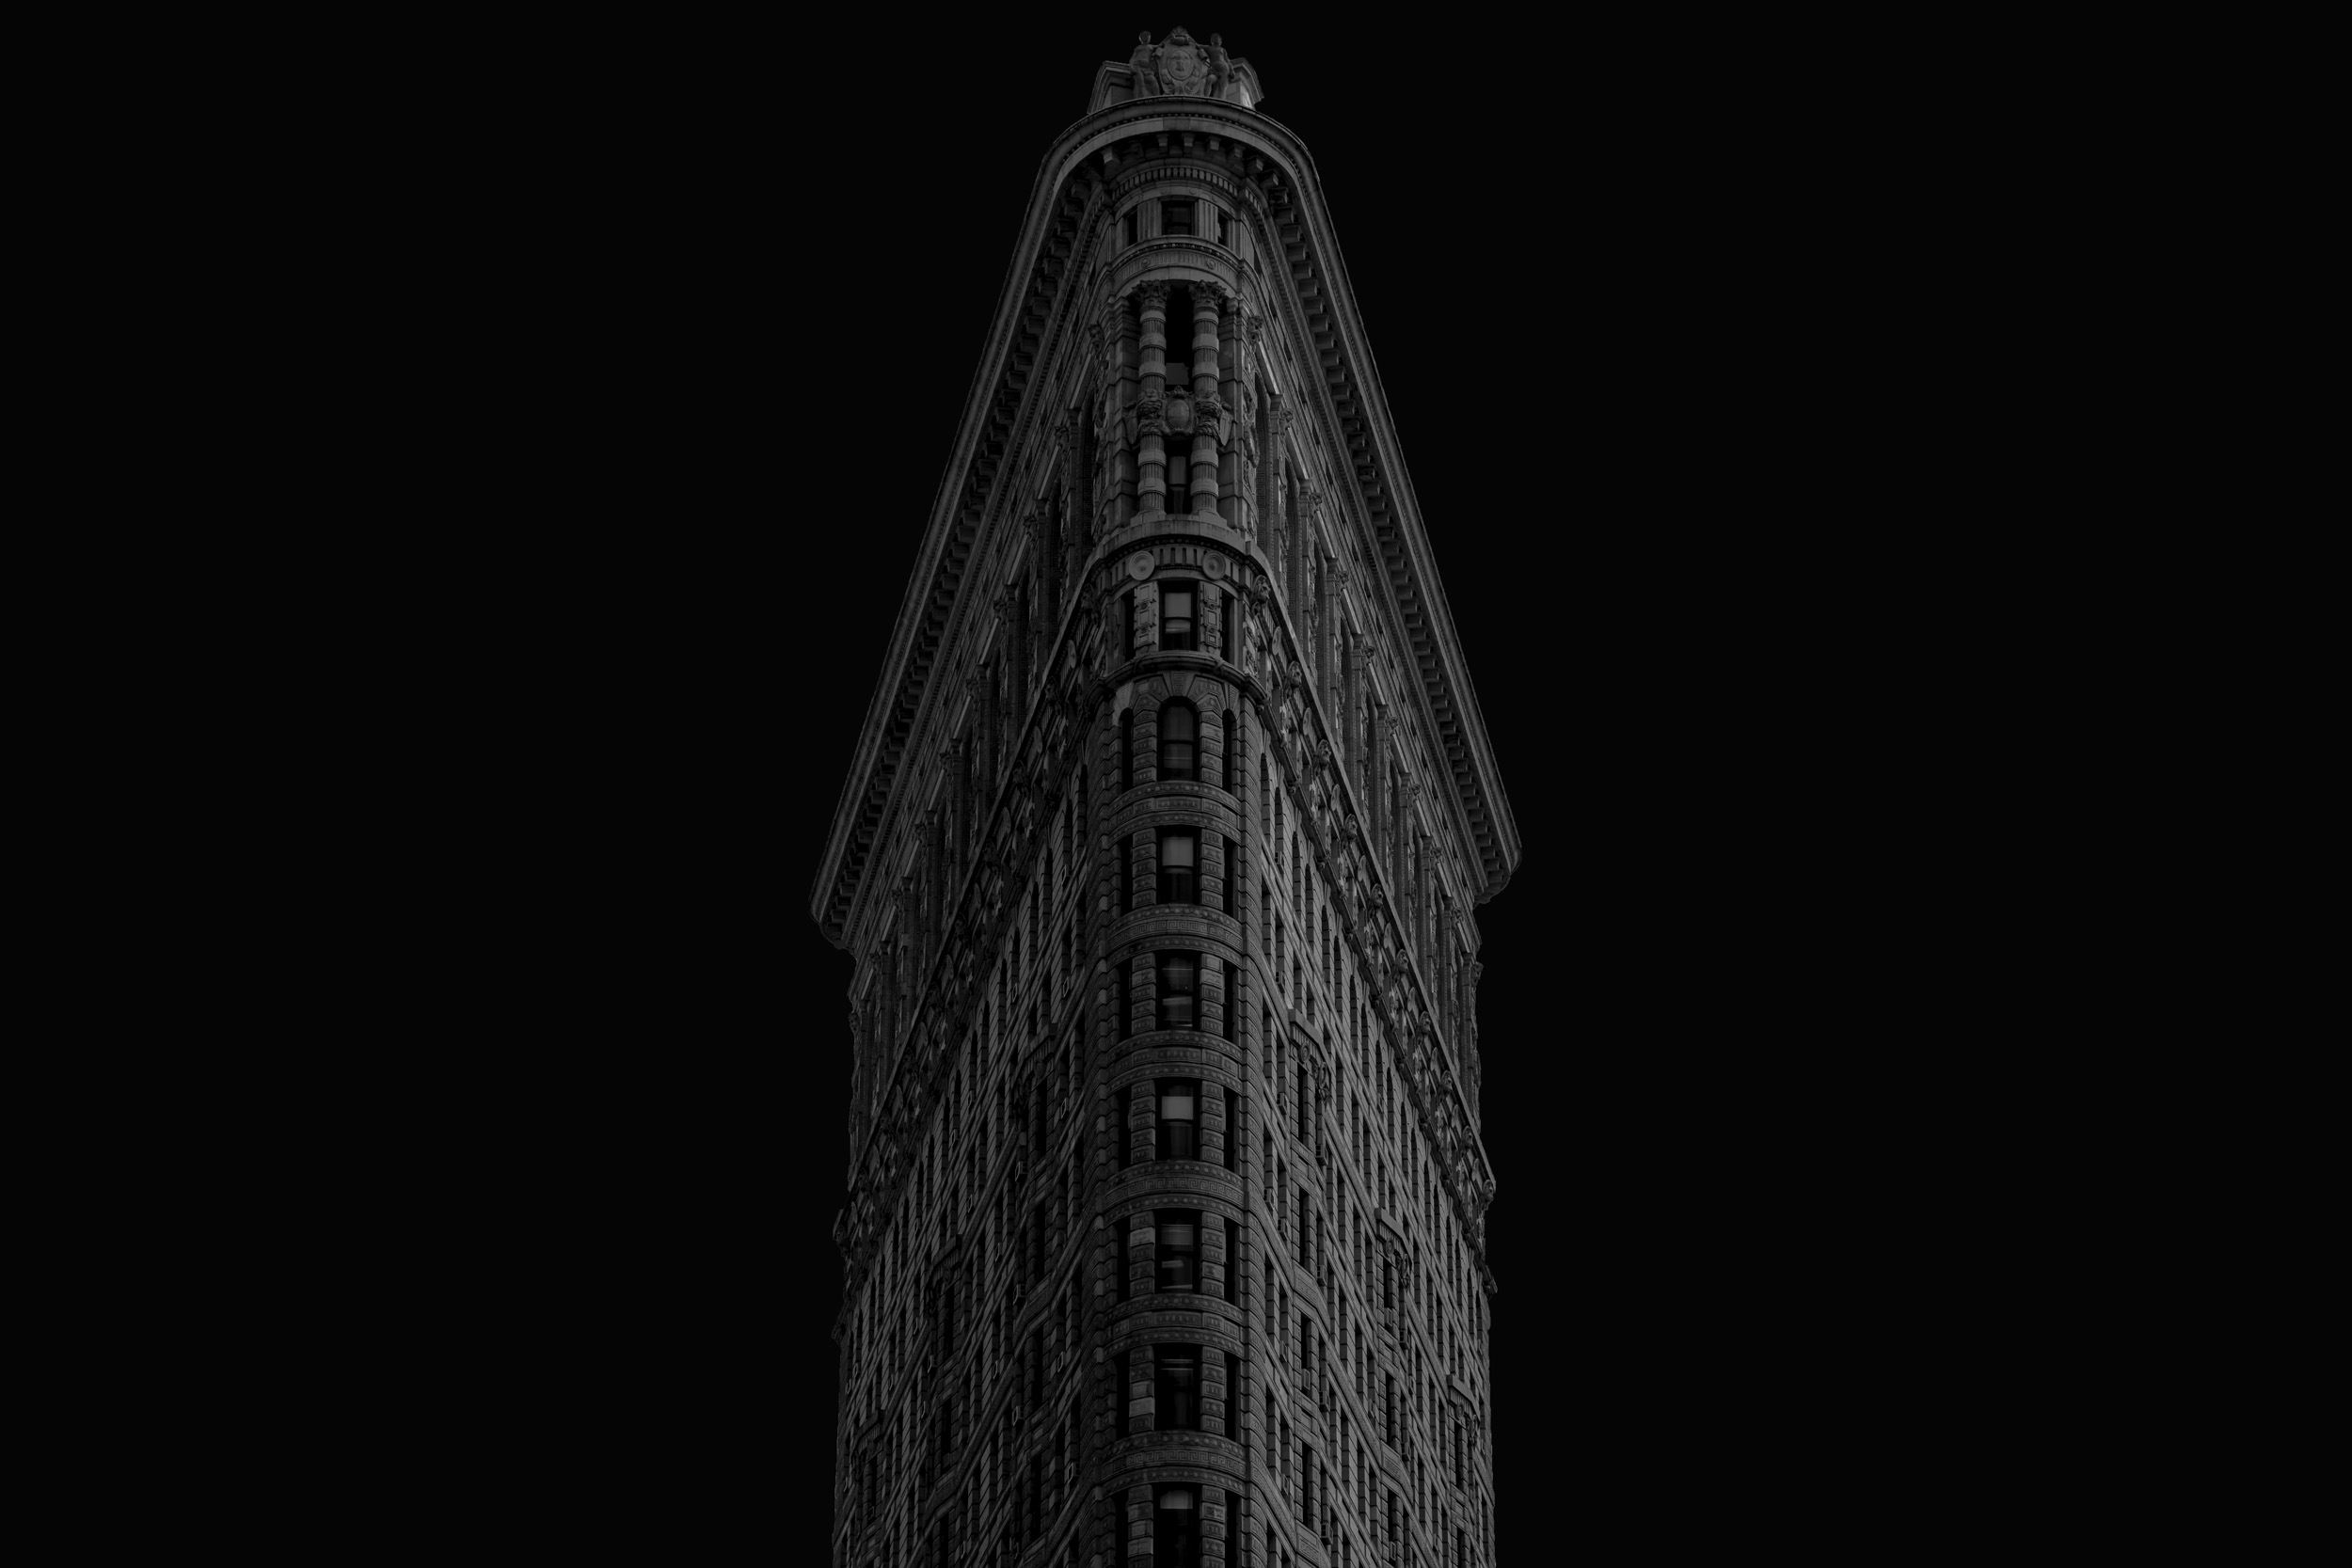 Flatiron Building B&W